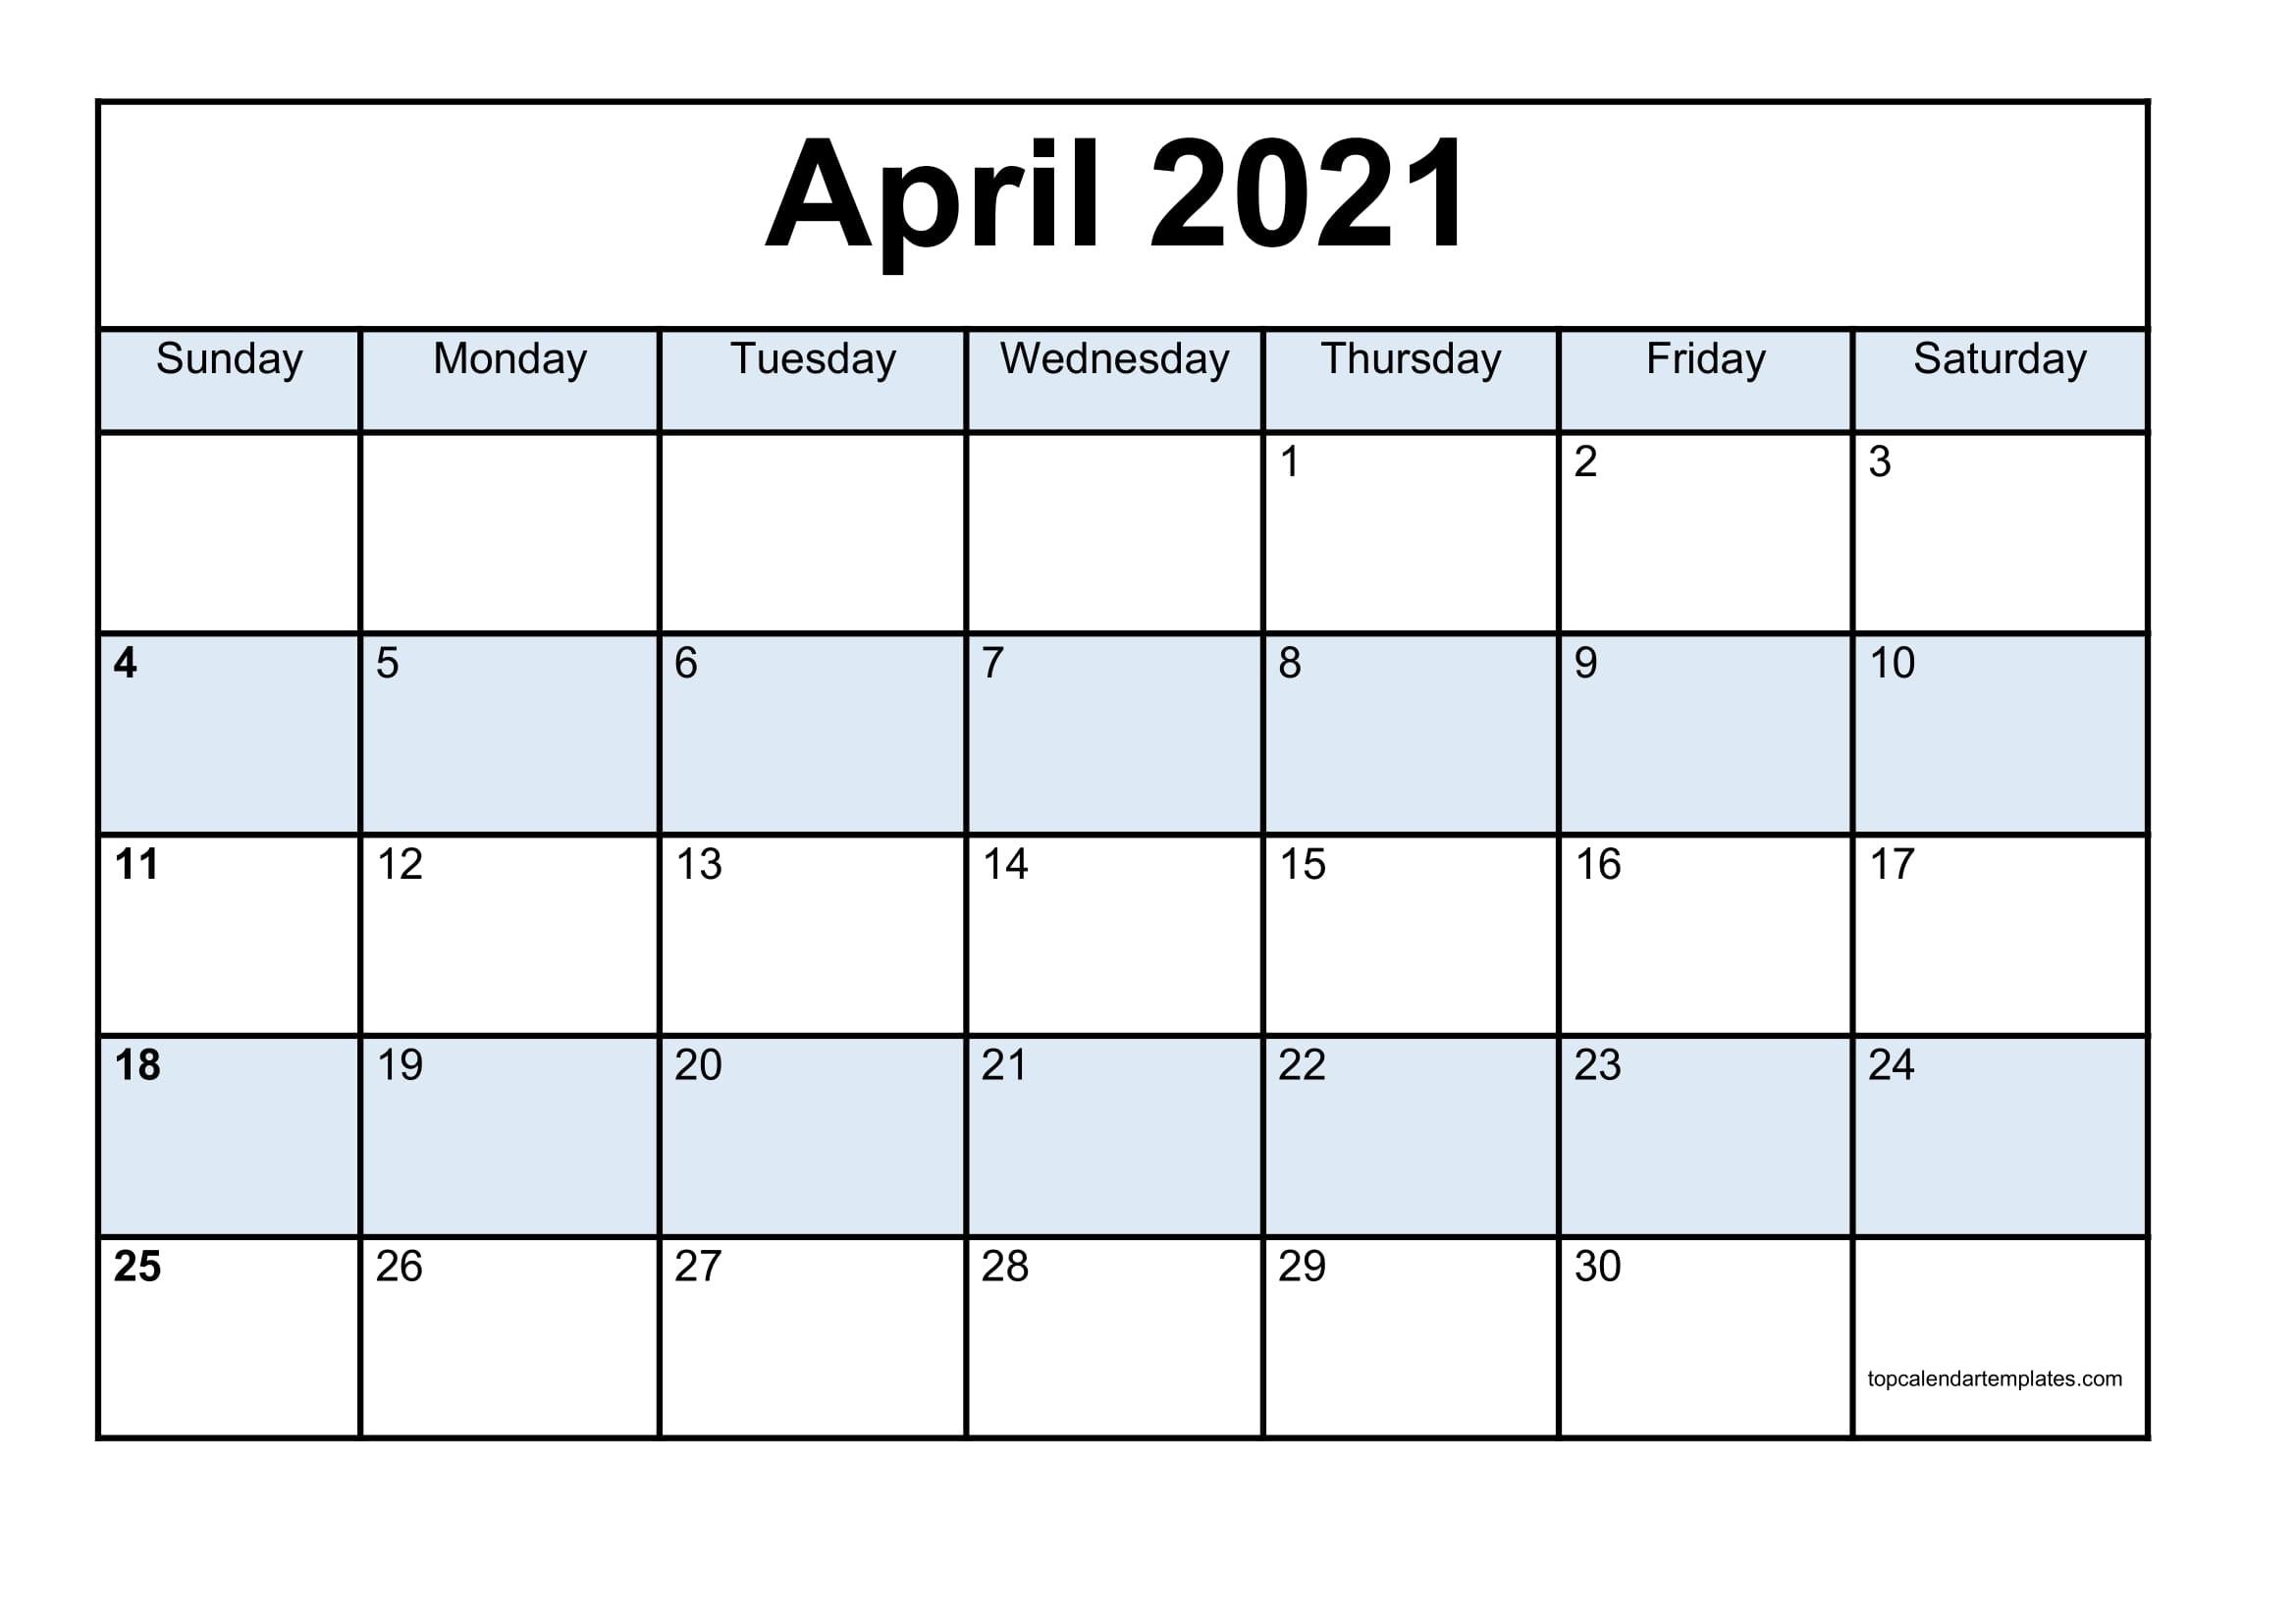 Free April 2021 Printable Calendar In Editable Format Editable December 2021 Calendar